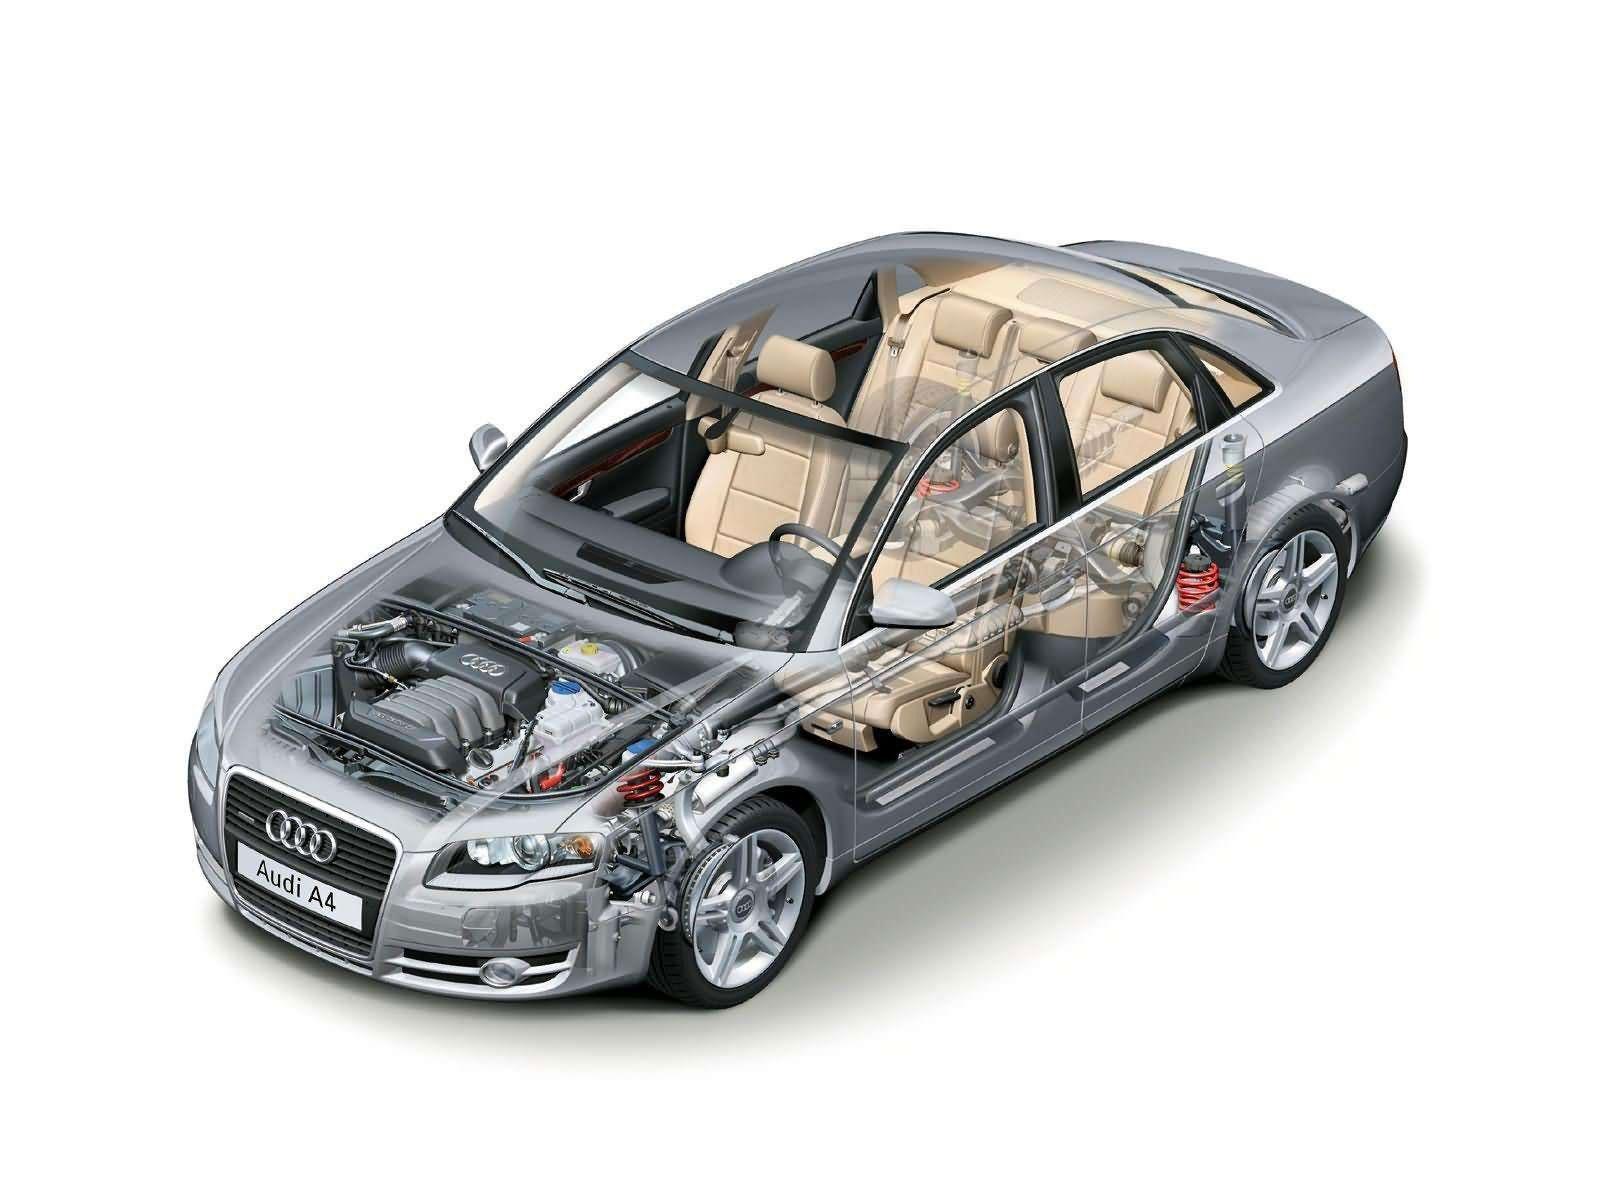 Audi A4 2005 cutaway drawing